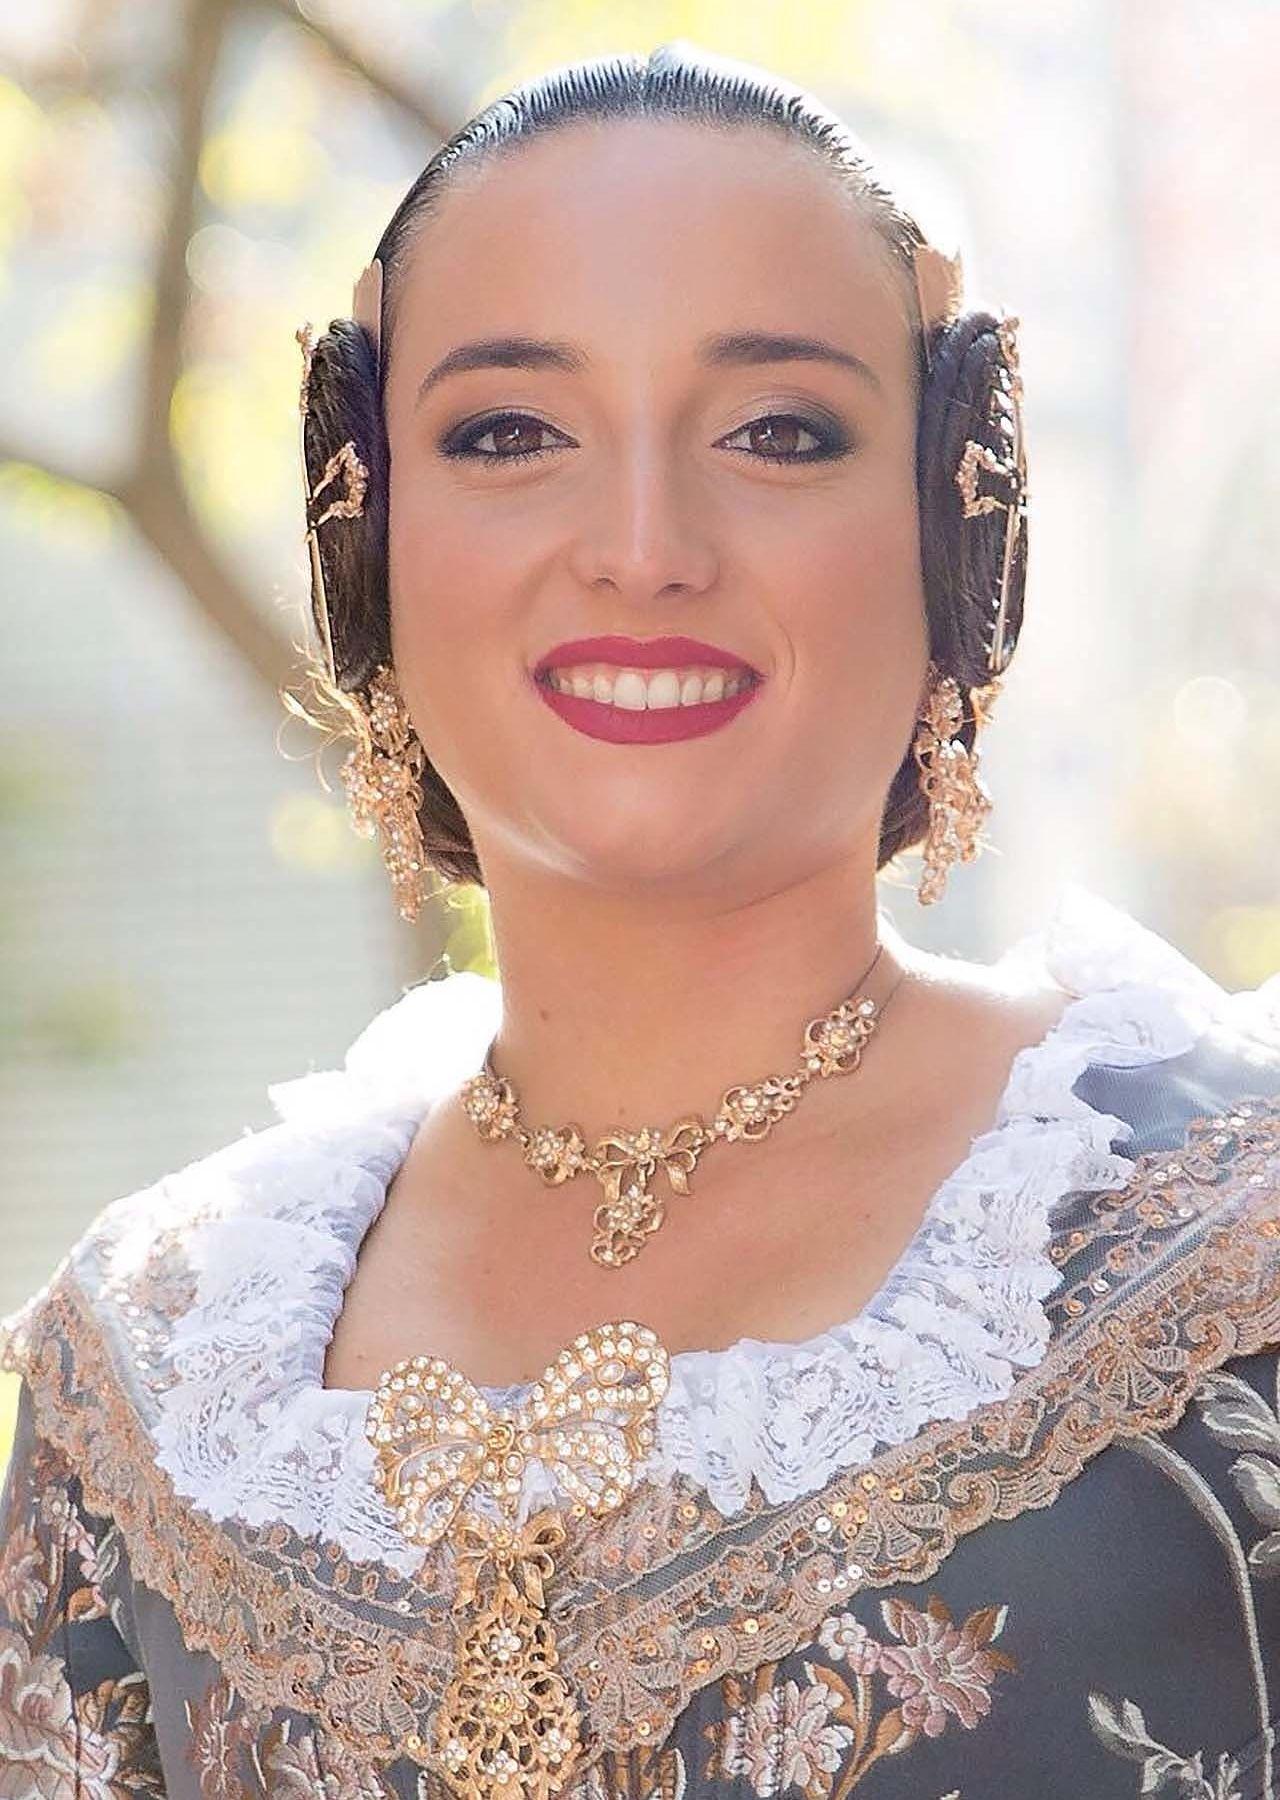 Julia Correcher Carbonell